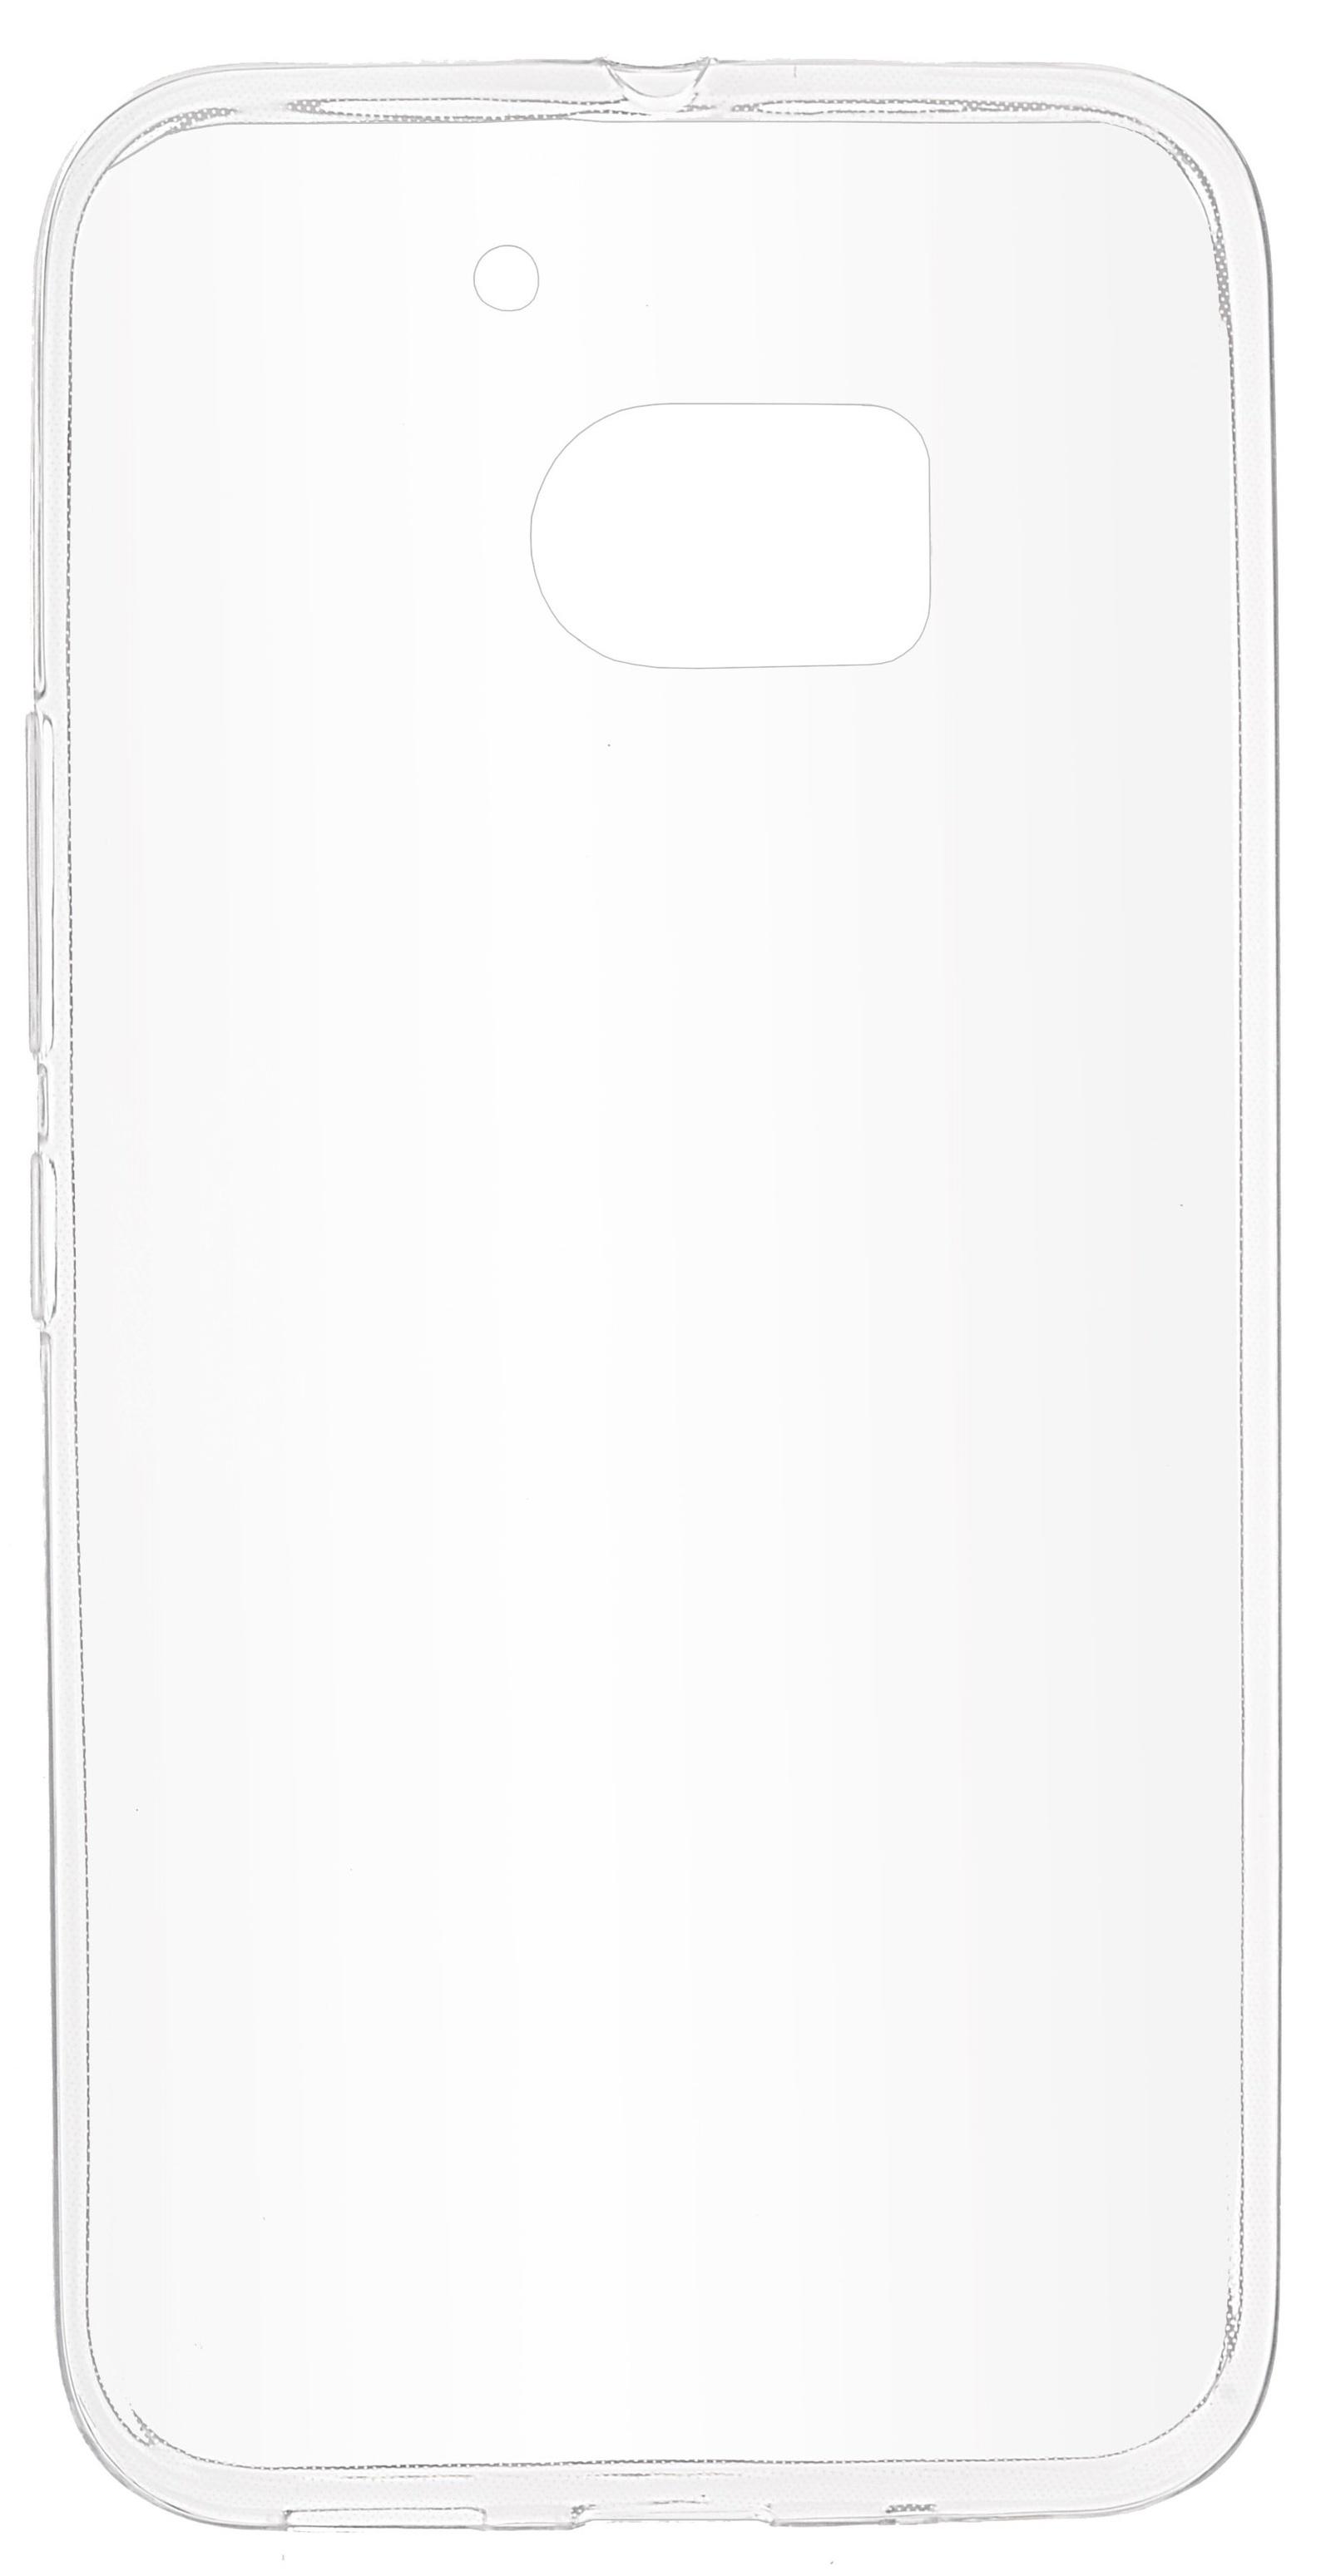 Чехол для сотового телефона skinBOX Slim Silicone, 4630042528864, прозрачный чехол для xiaomi redmi pro skinbox 4people slim silicone case прозрачный